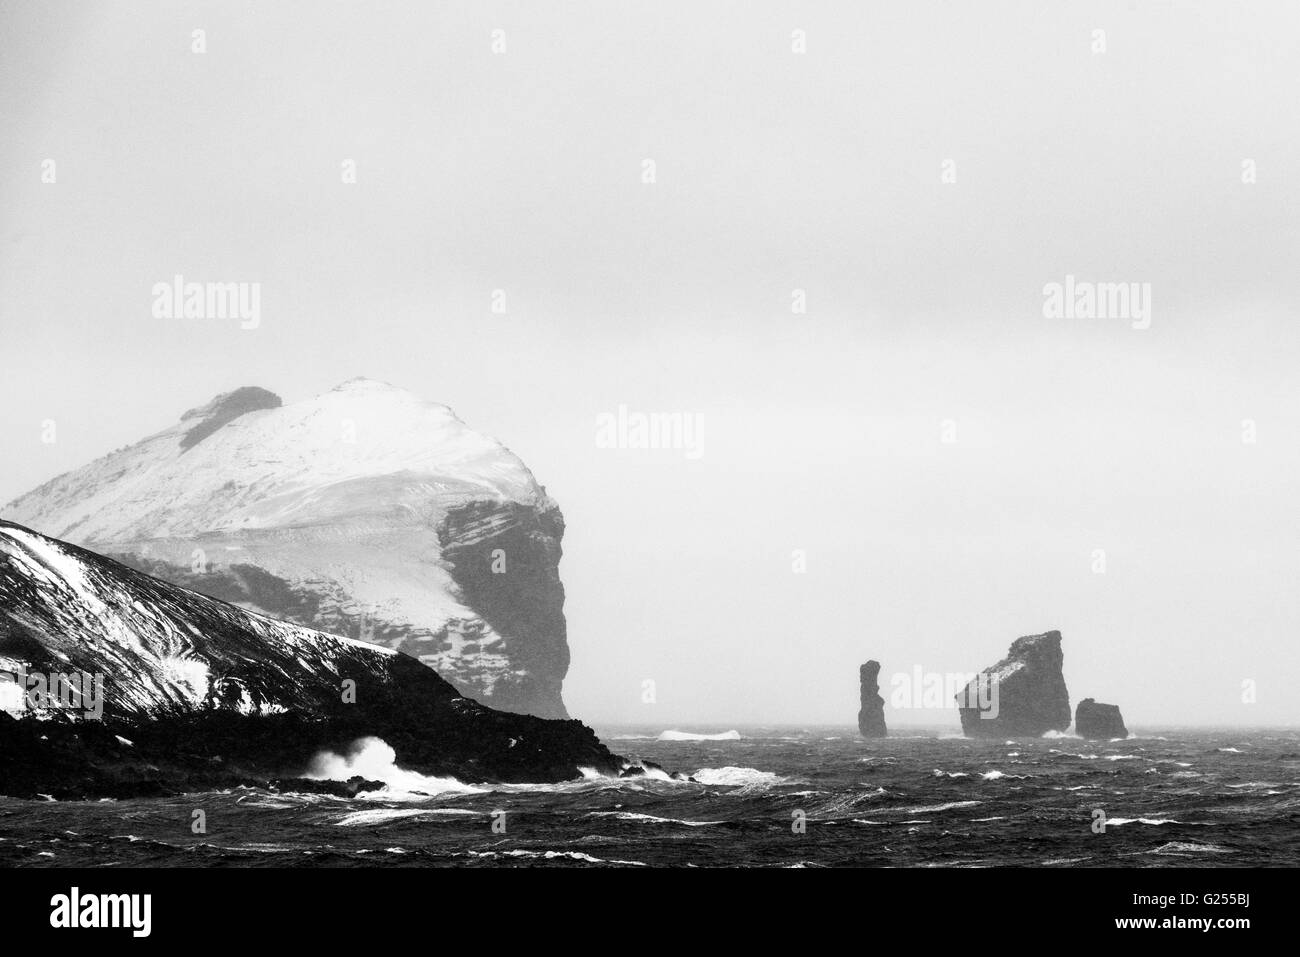 Rocks at the entrance to the caldera Deception Island, South Shetland Islands, Antarctica - Stock Image